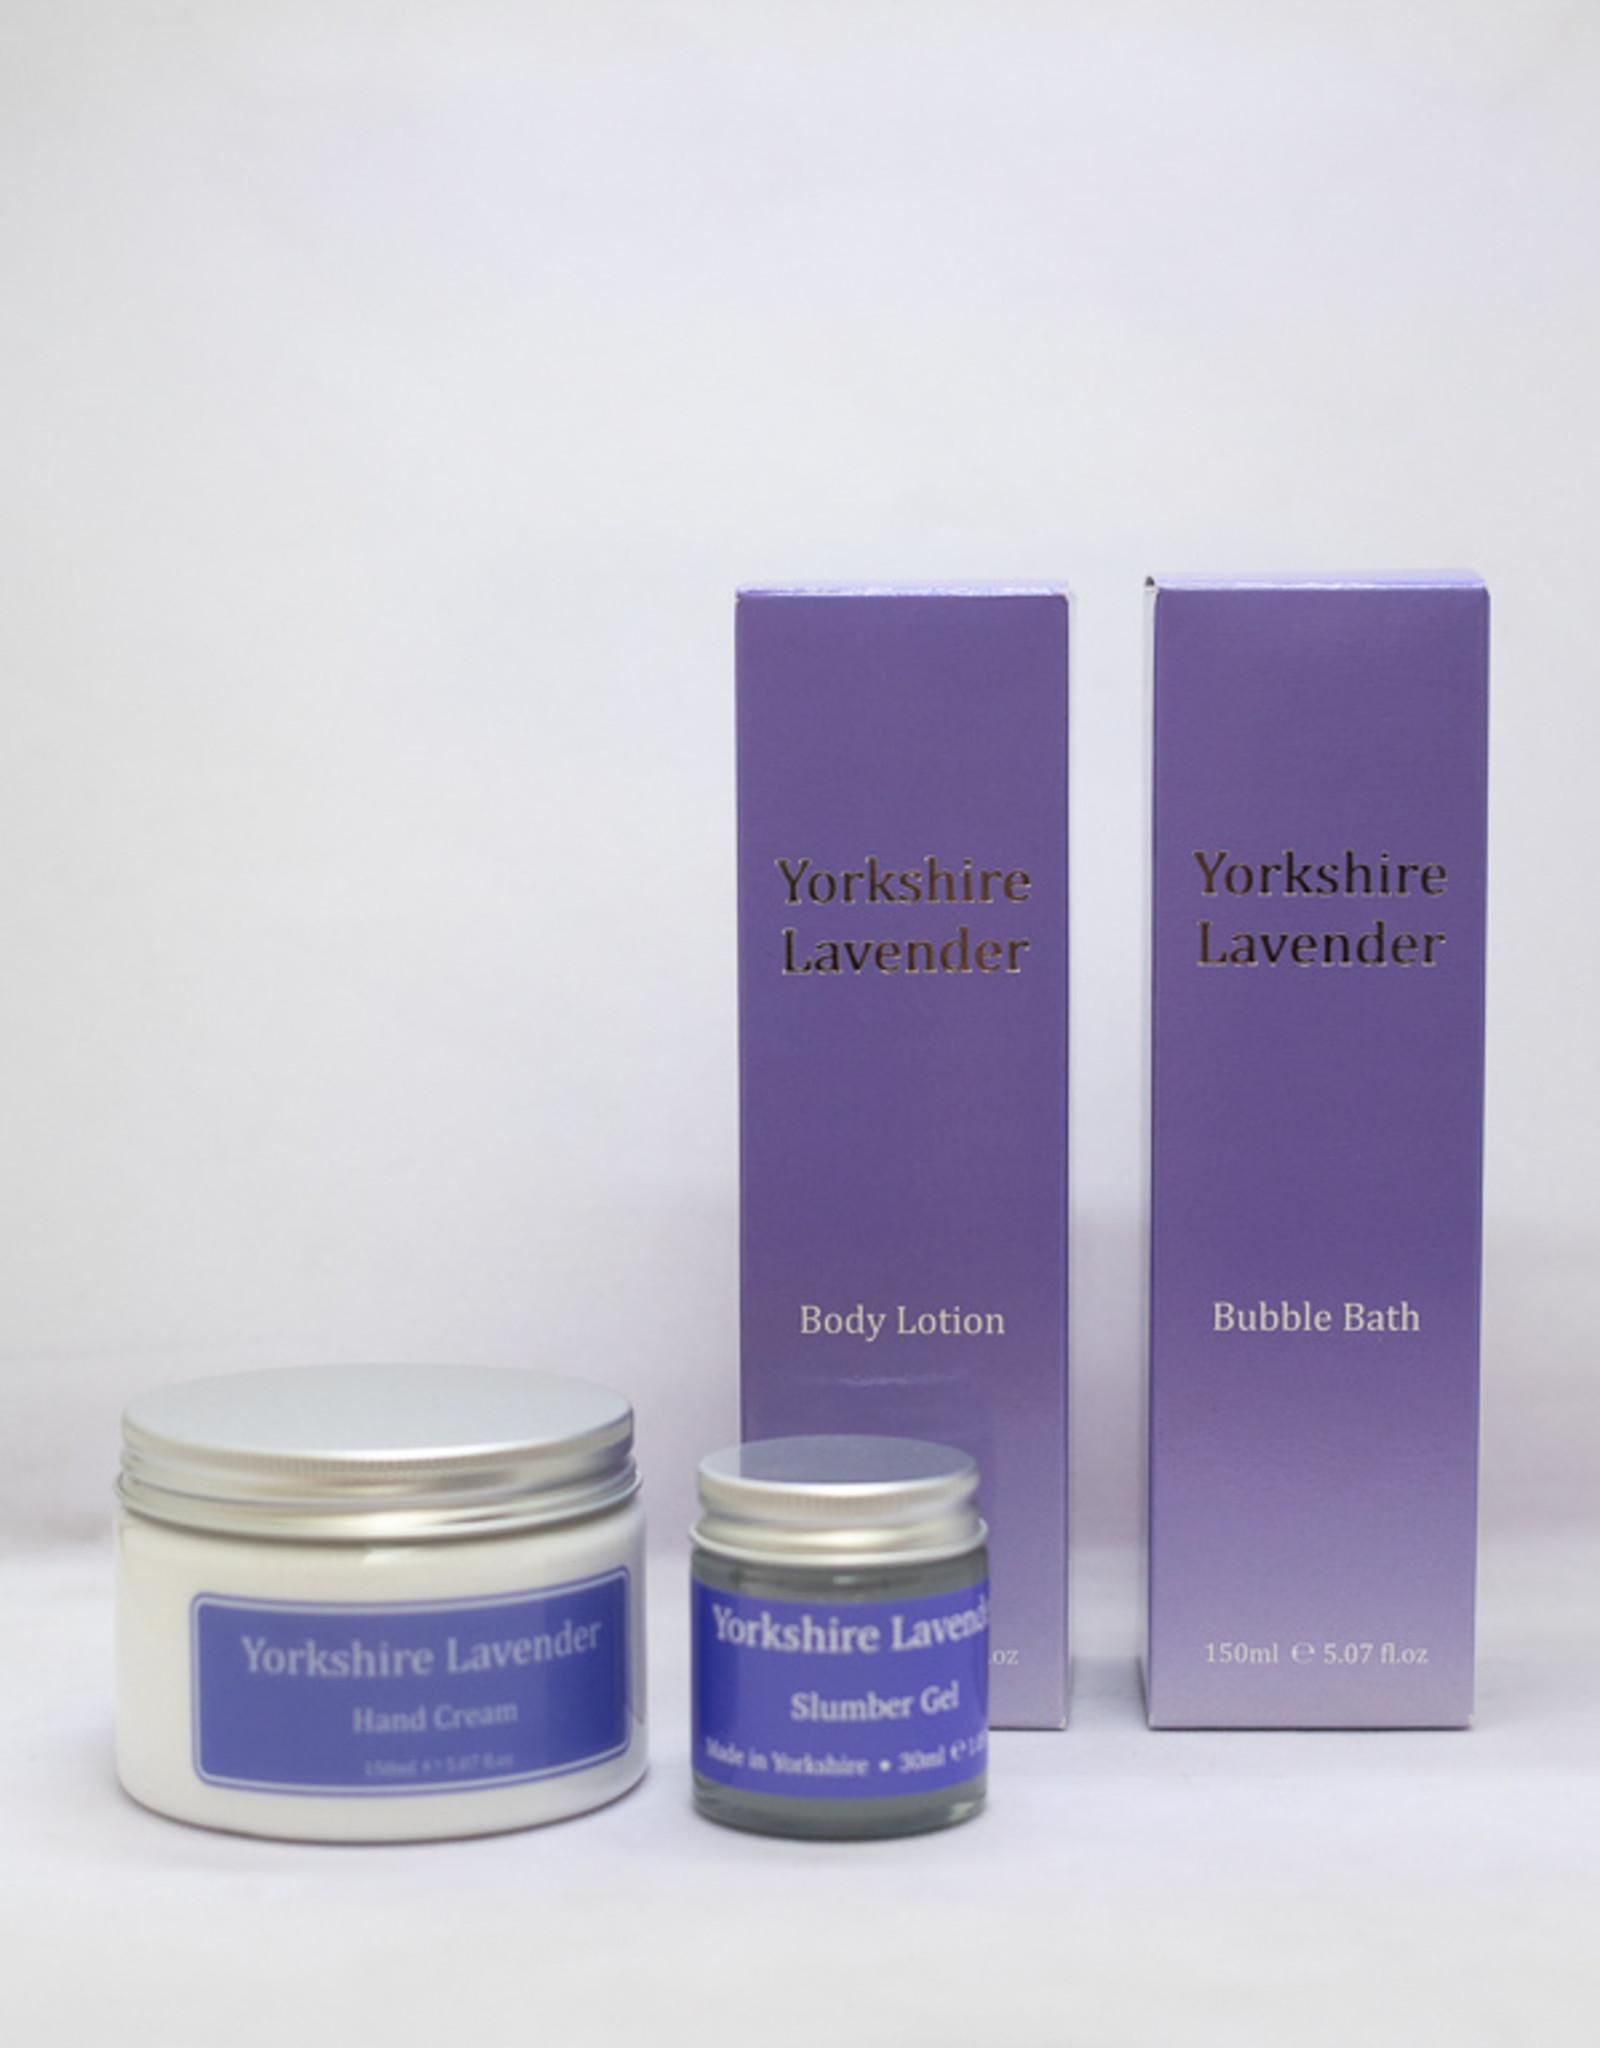 Lavender Lover's Hamper